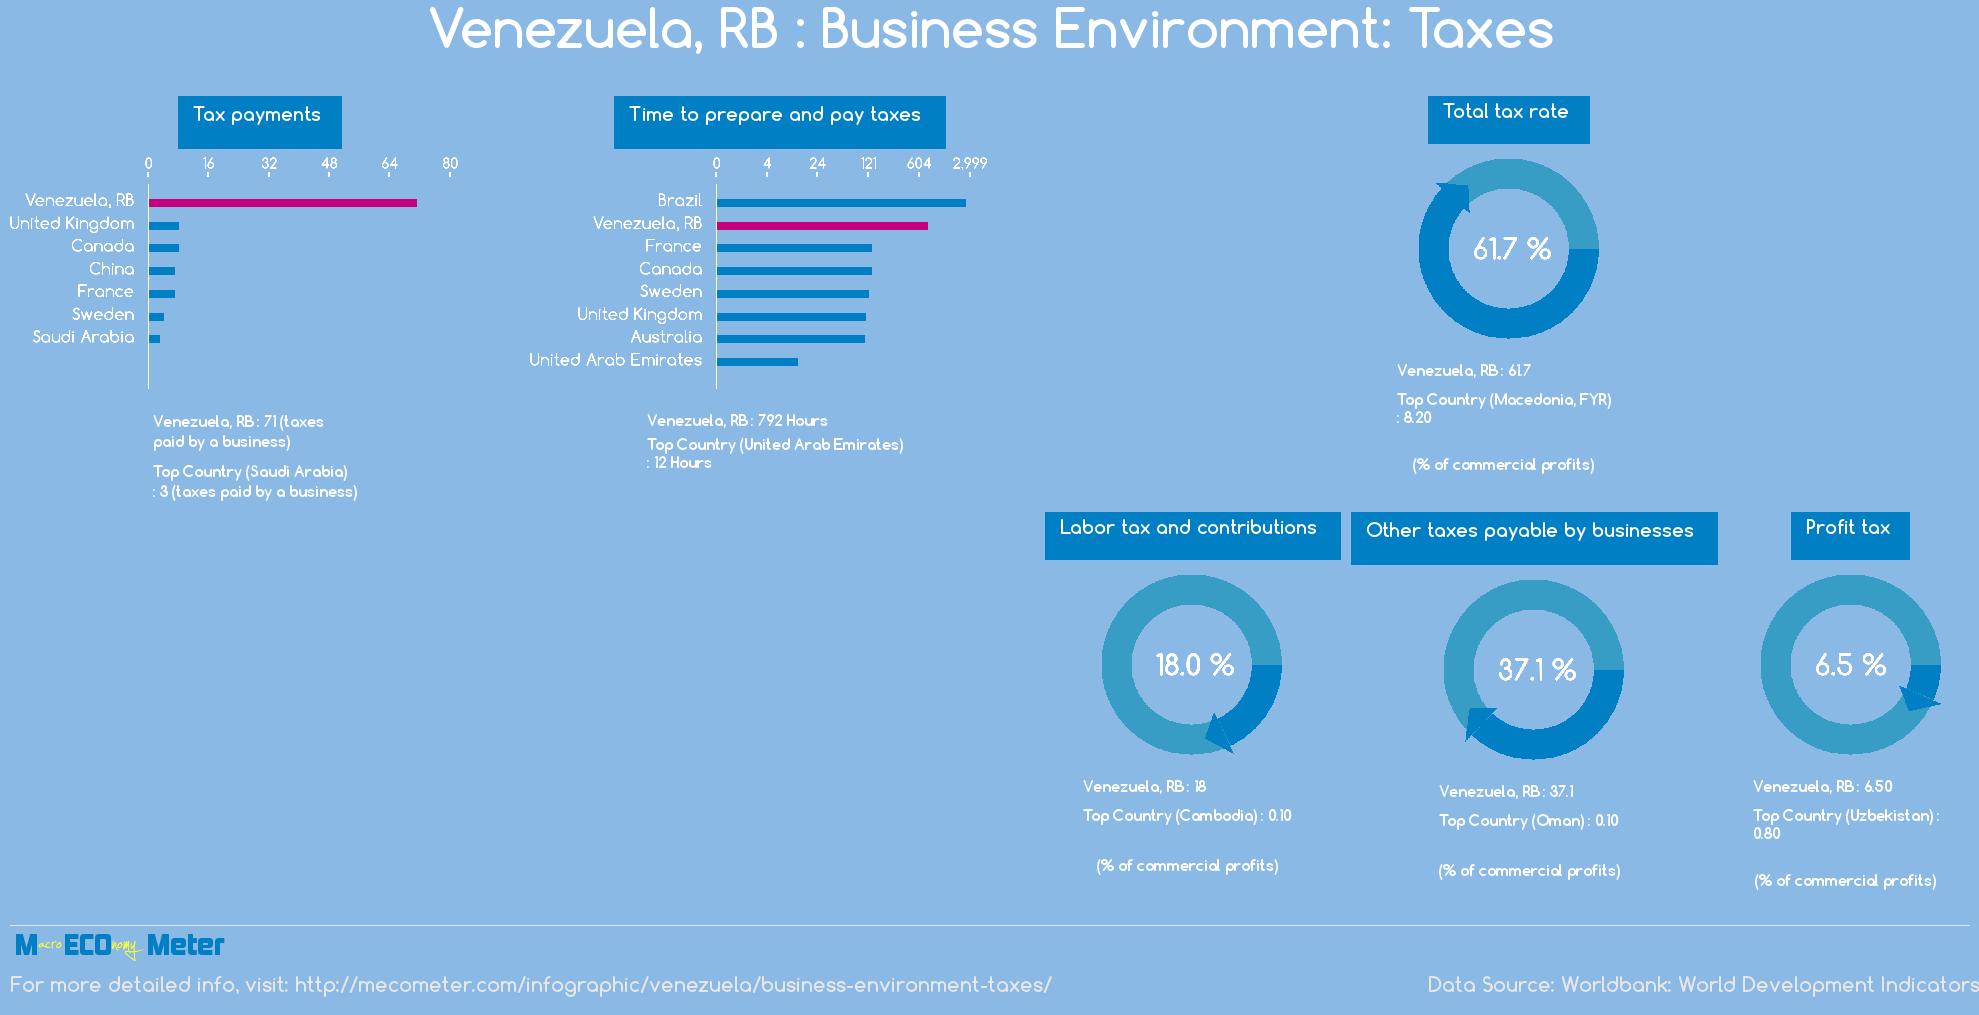 Venezuela, RB : Business Environment: Taxes